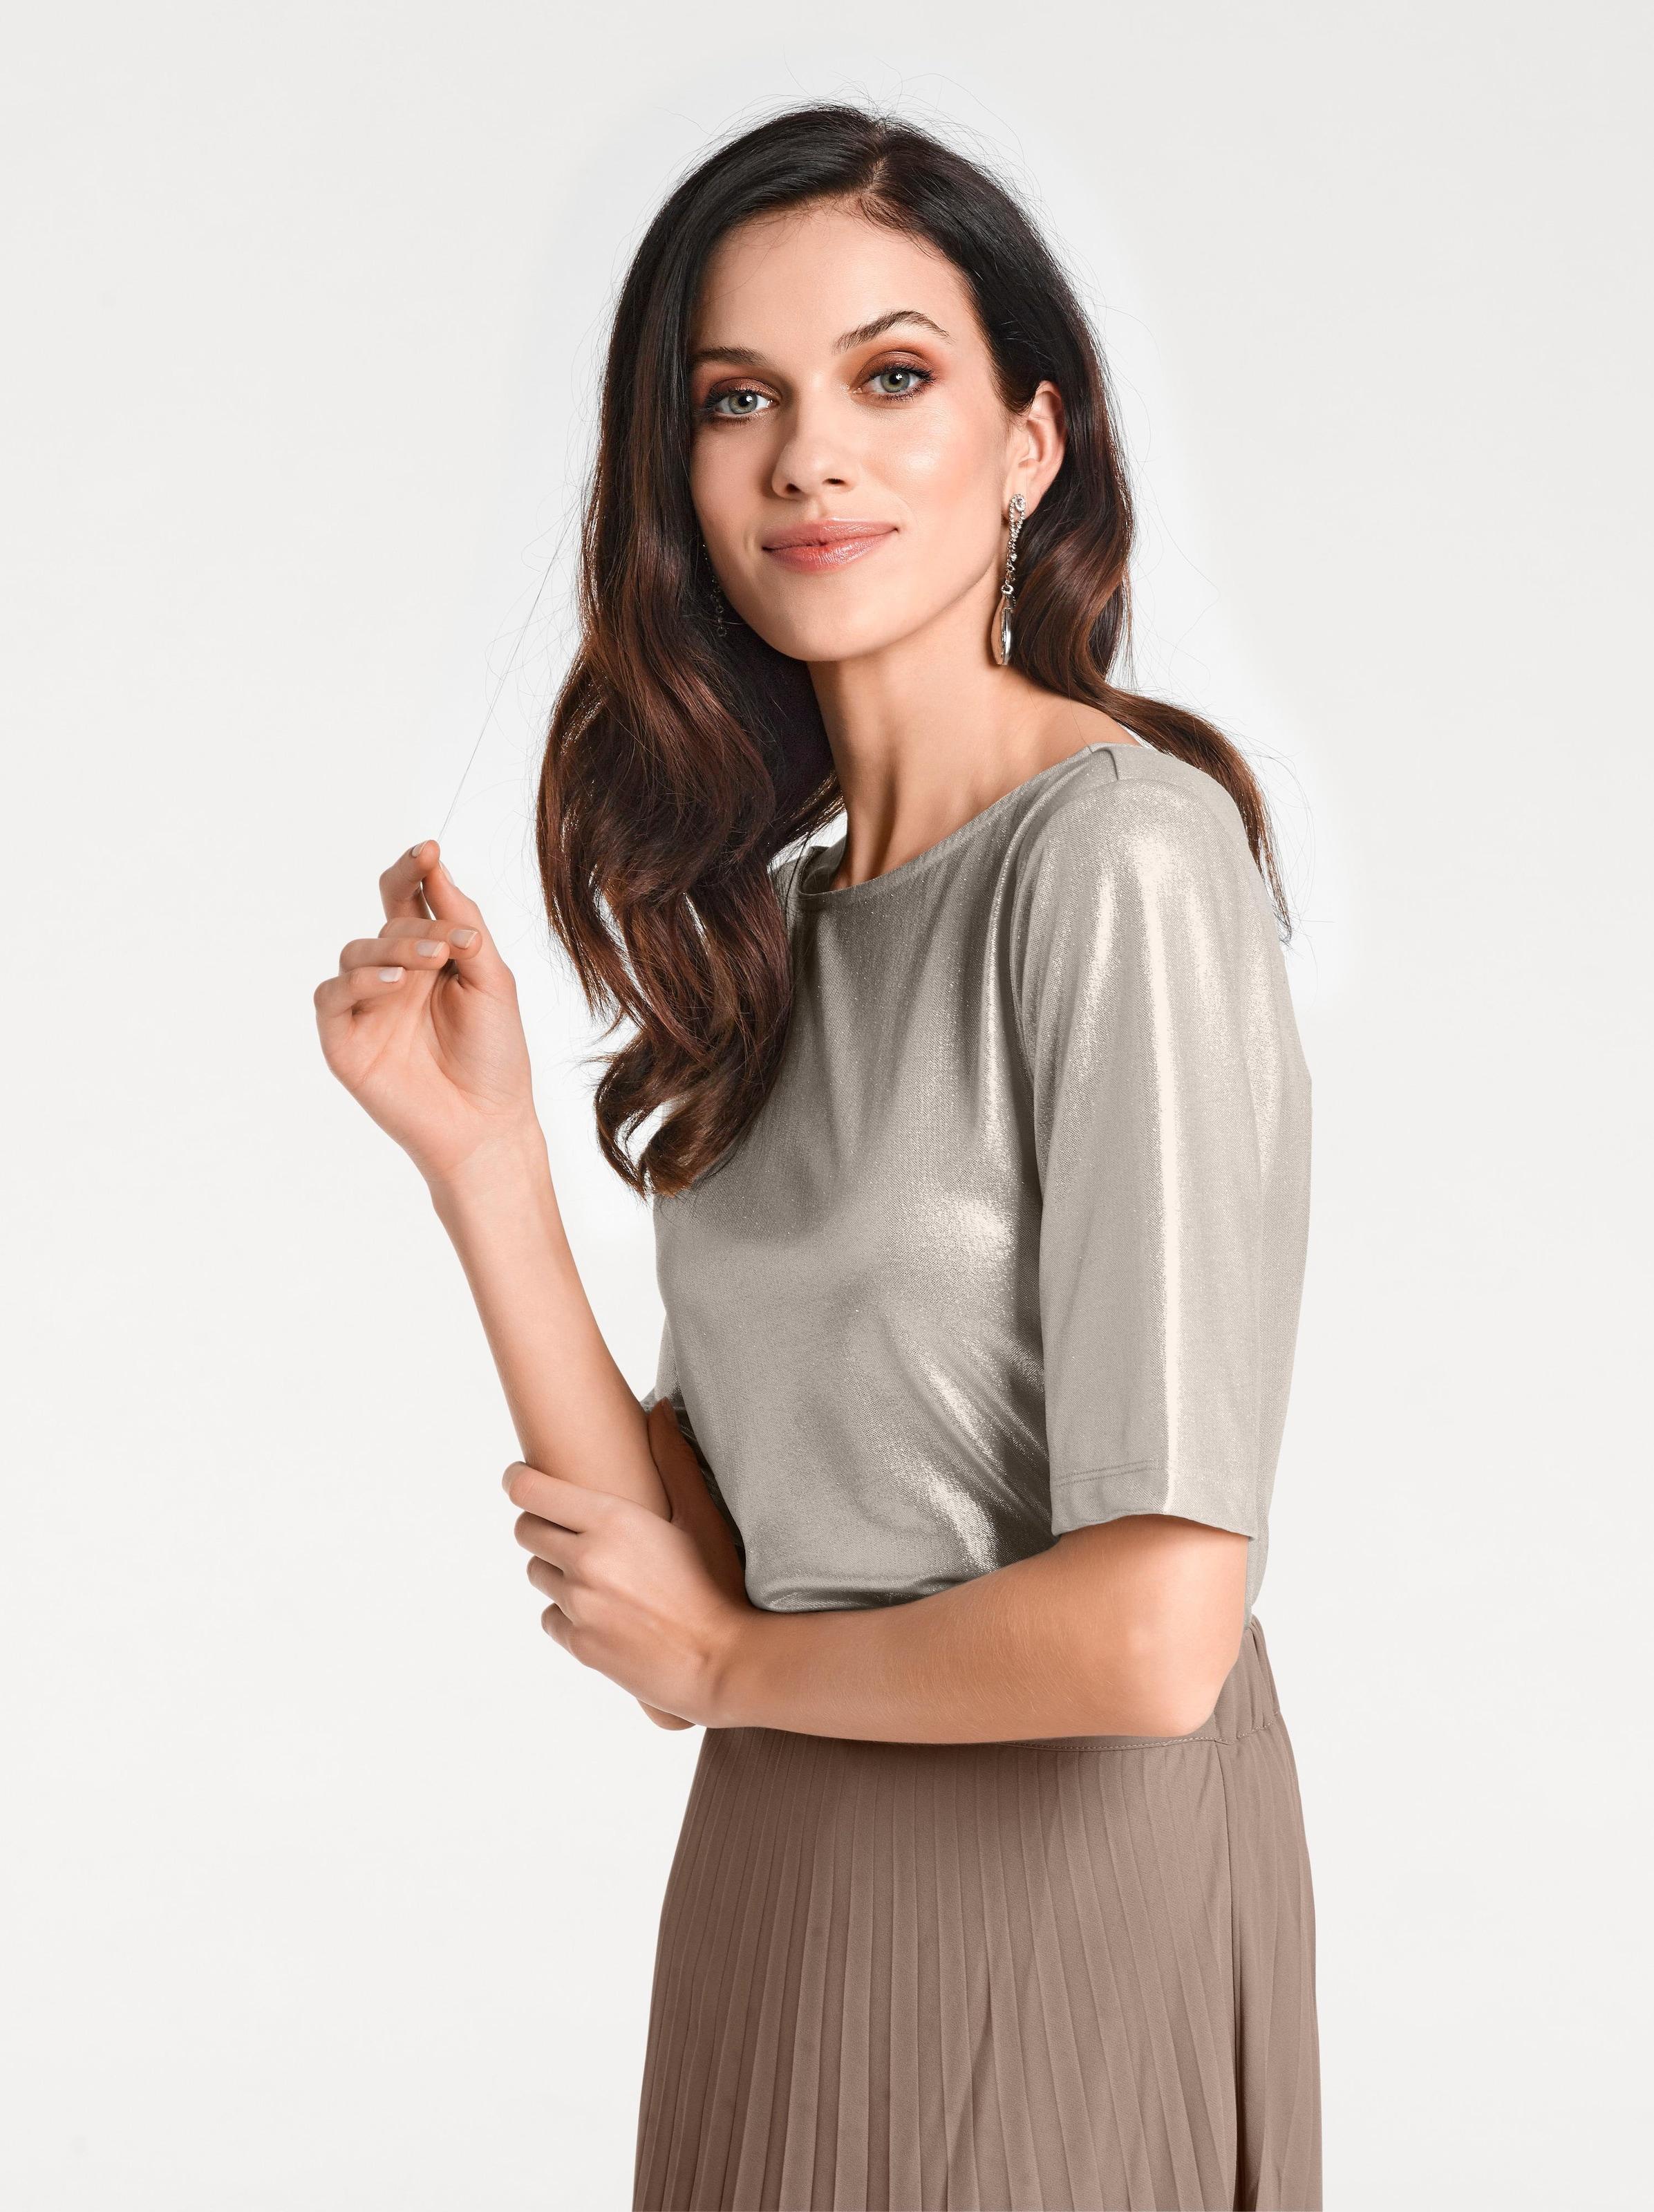 Rabatt Footlocker Bilder Rabatt Beste Geschäft Zu Bekommen Ashley Brooke by heine Shirt mit Rückenausschnitt VbBdddbr4A